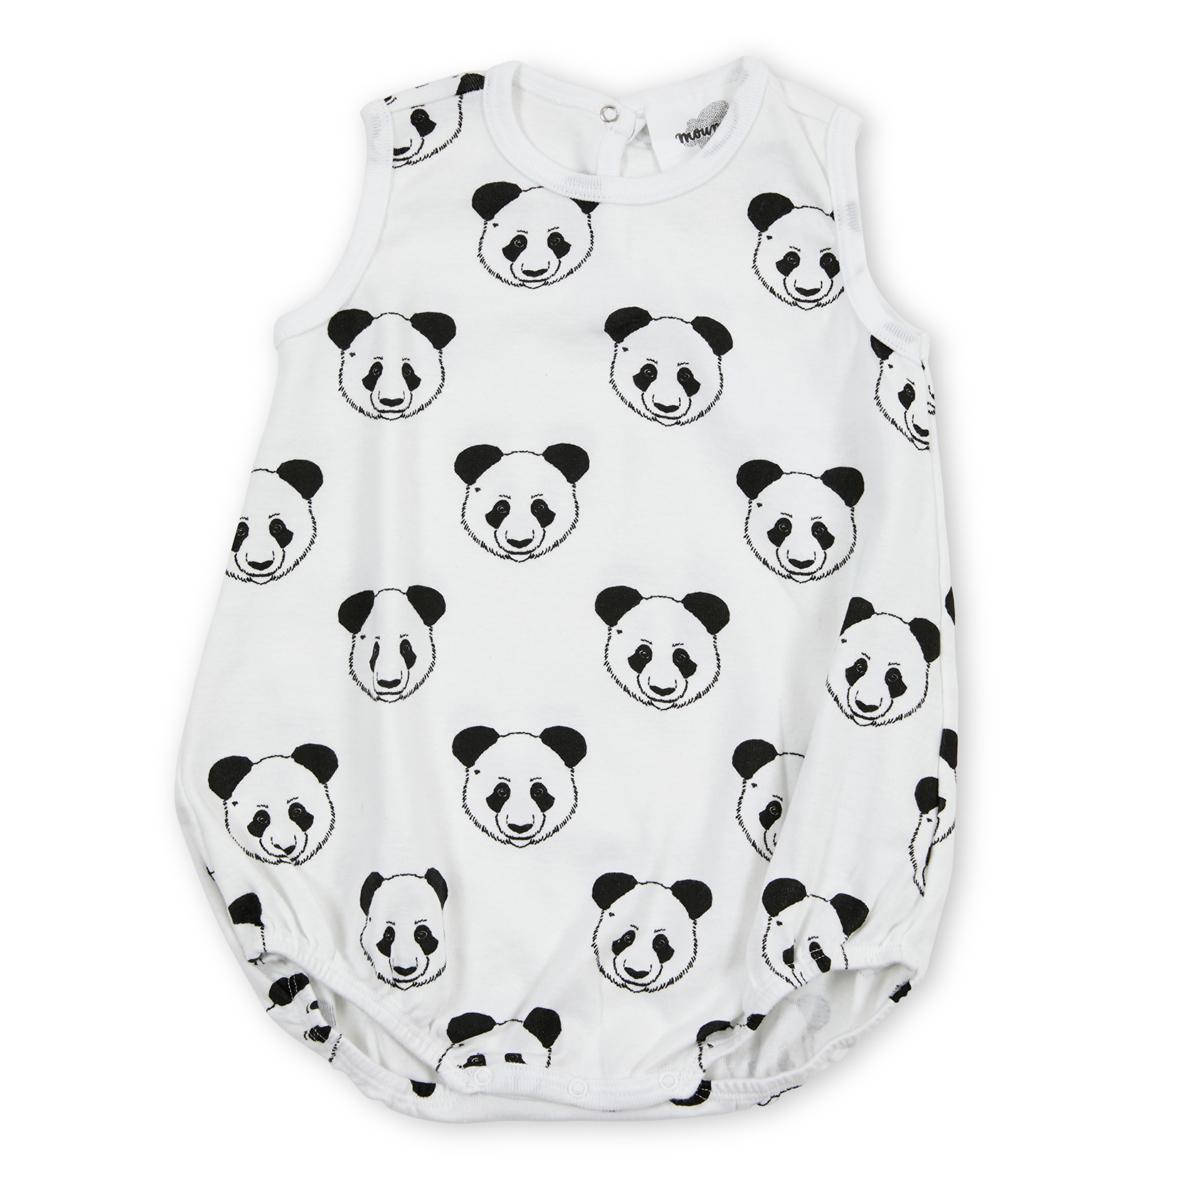 Robe & Combinaison Baba Barboteuse Panda - 3 ans Baba Barboteuse Panda - 3 ans